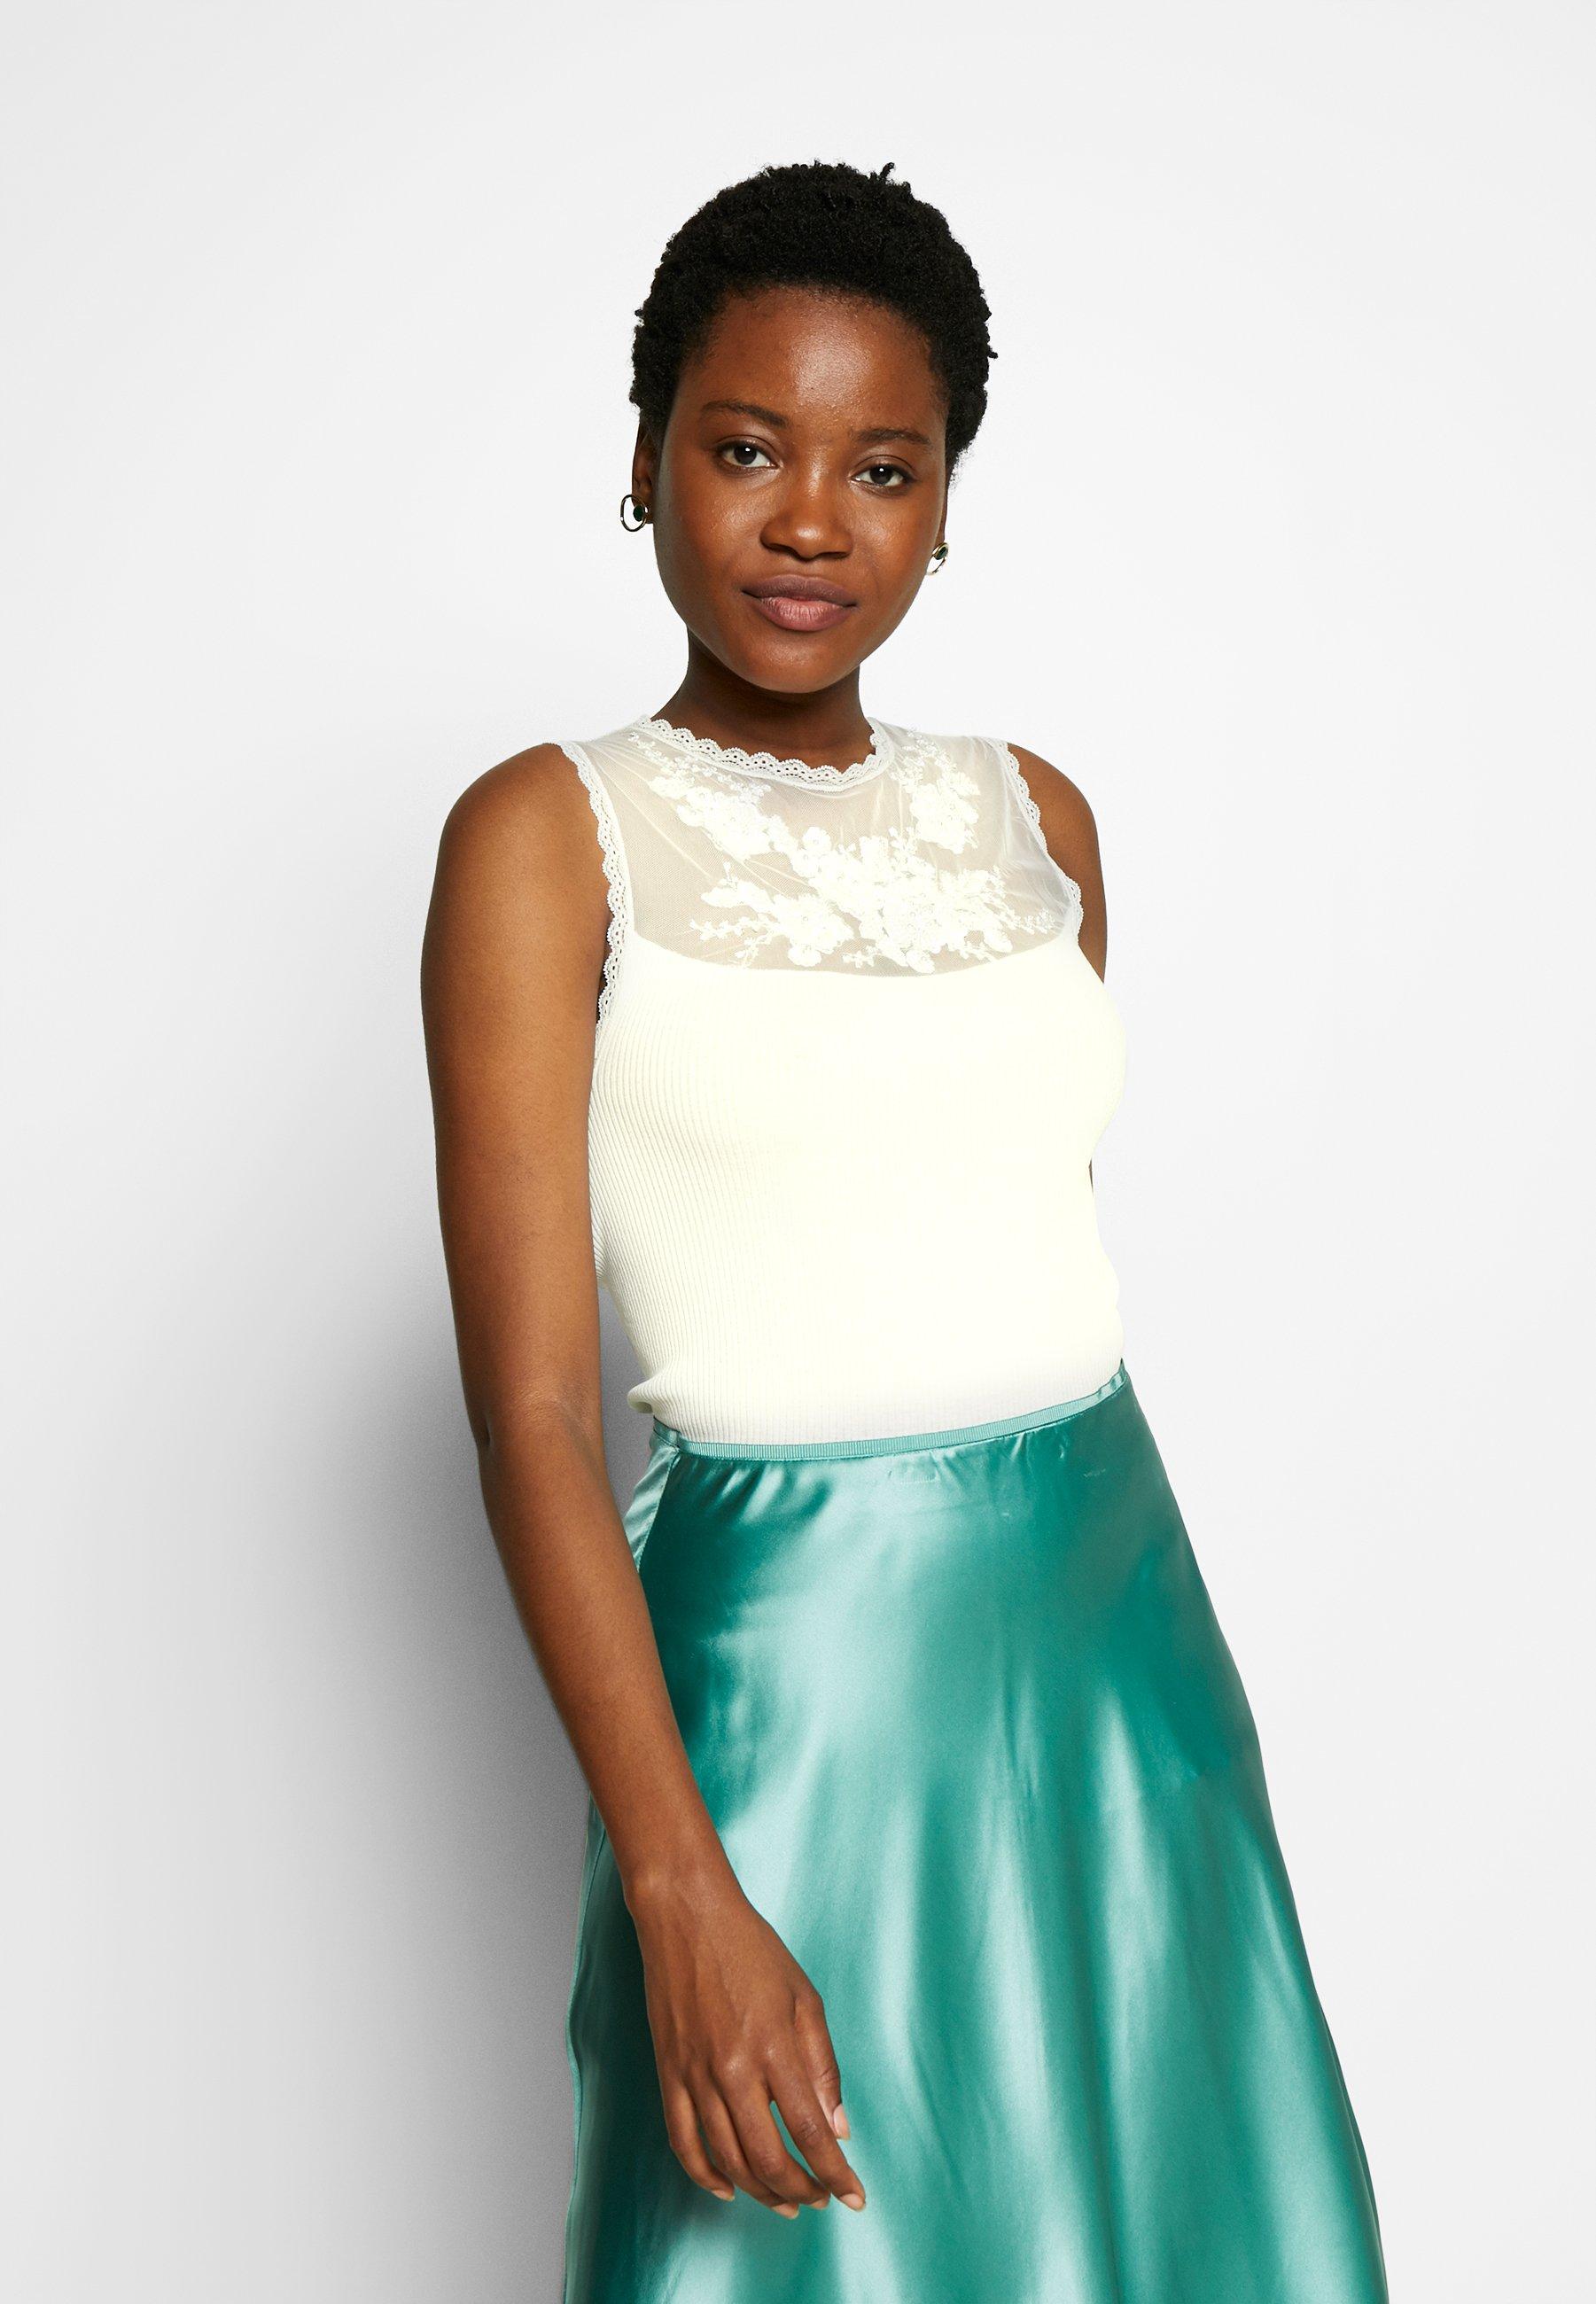 Rosemunde SILK-MIX TOP REGULAR W/EMBELLISHMENT - Débardeur - ivory - Tops & T-shirts Femme rsByt